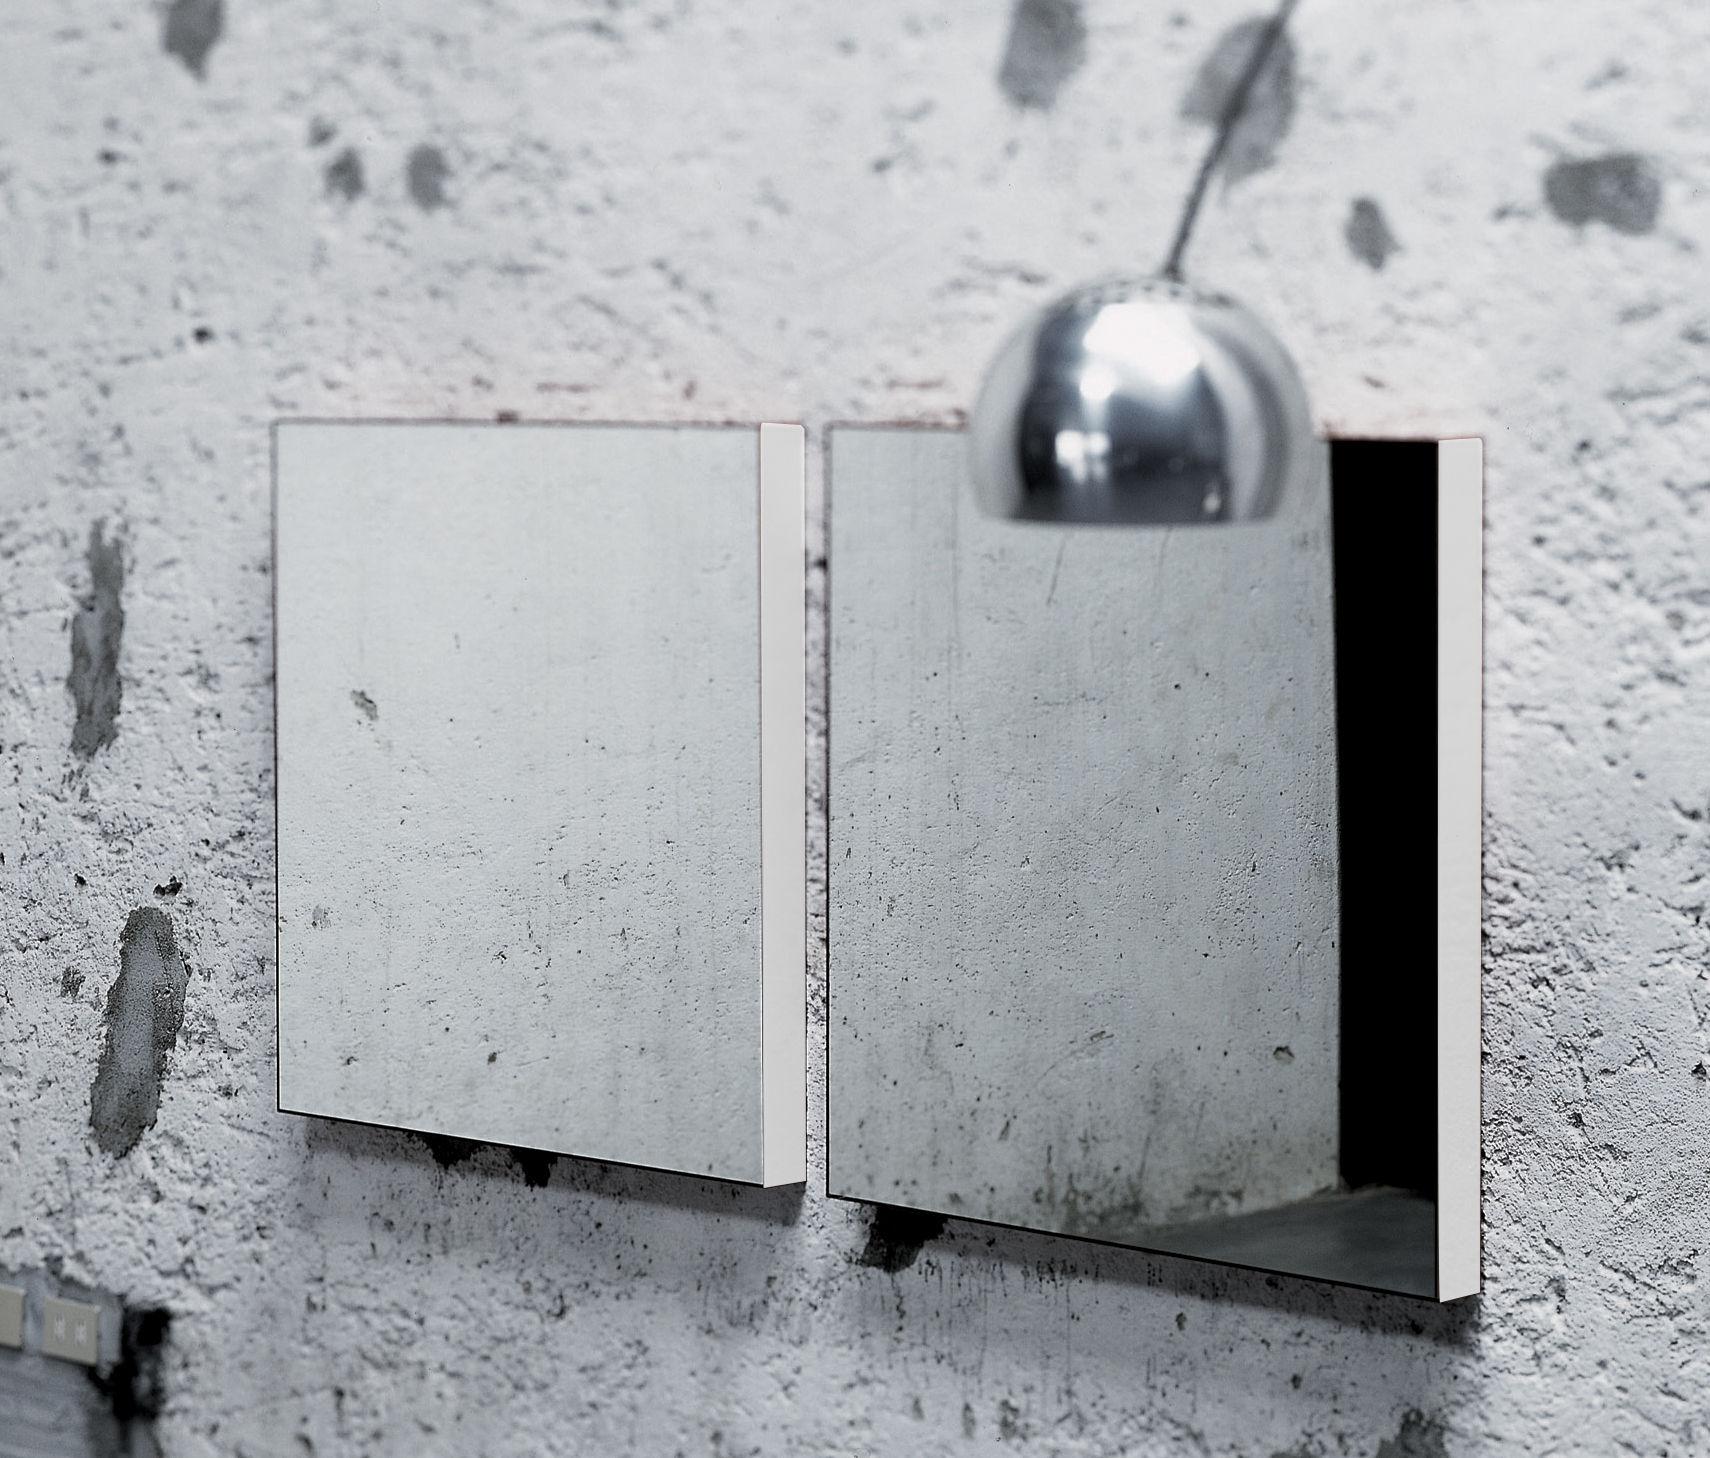 Mobilier - Miroirs - Miroir mural Giano / version murale - 90 x 90 cm - Glas Italia - Laqué blanc - Verre